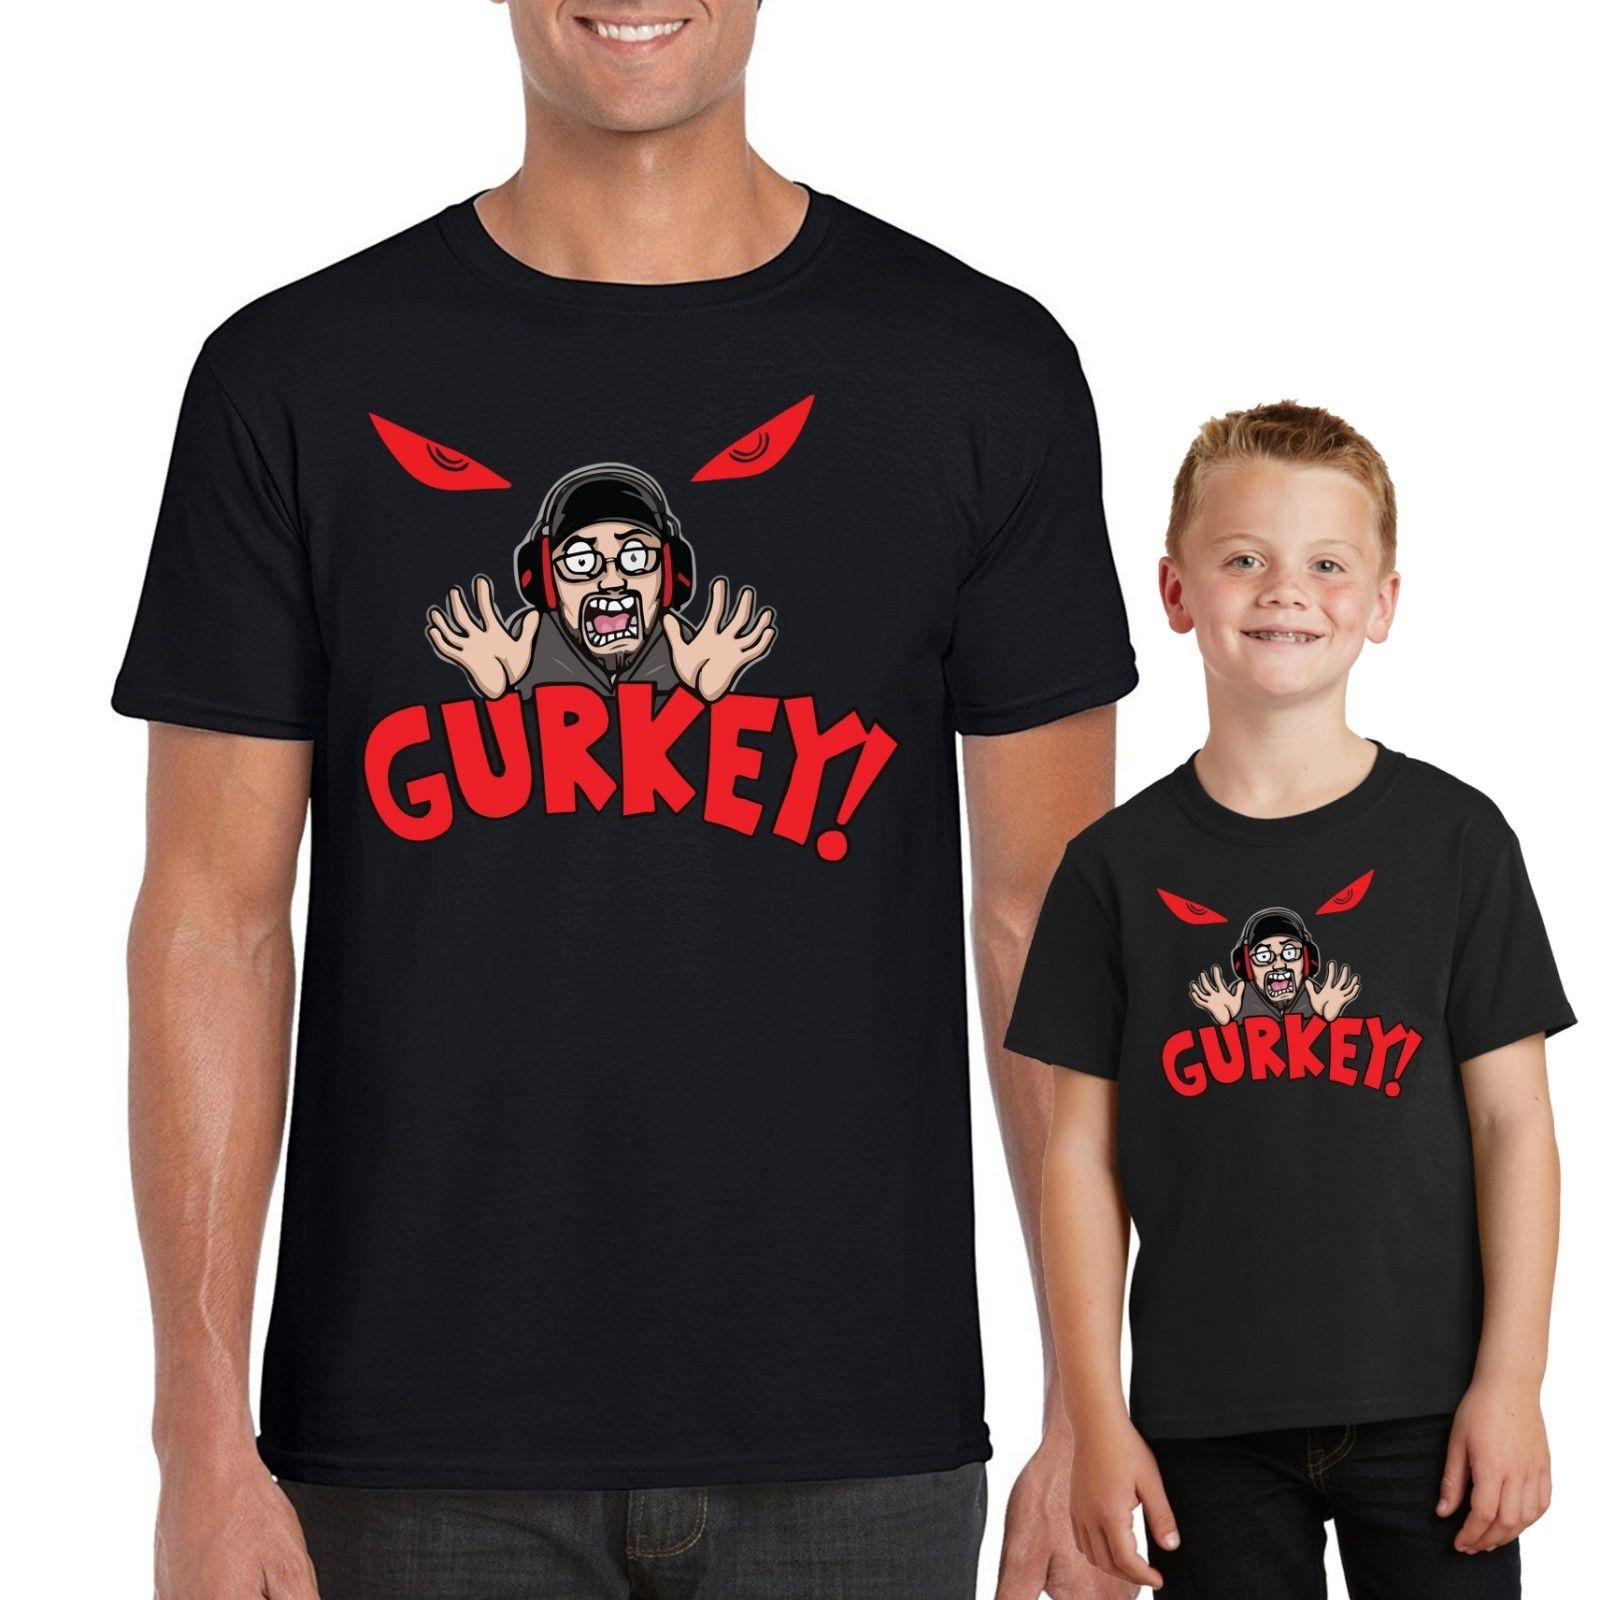 GURKEY Funnel Vision T-Shirt B80 FGTeeV Gaming Team Kids Top